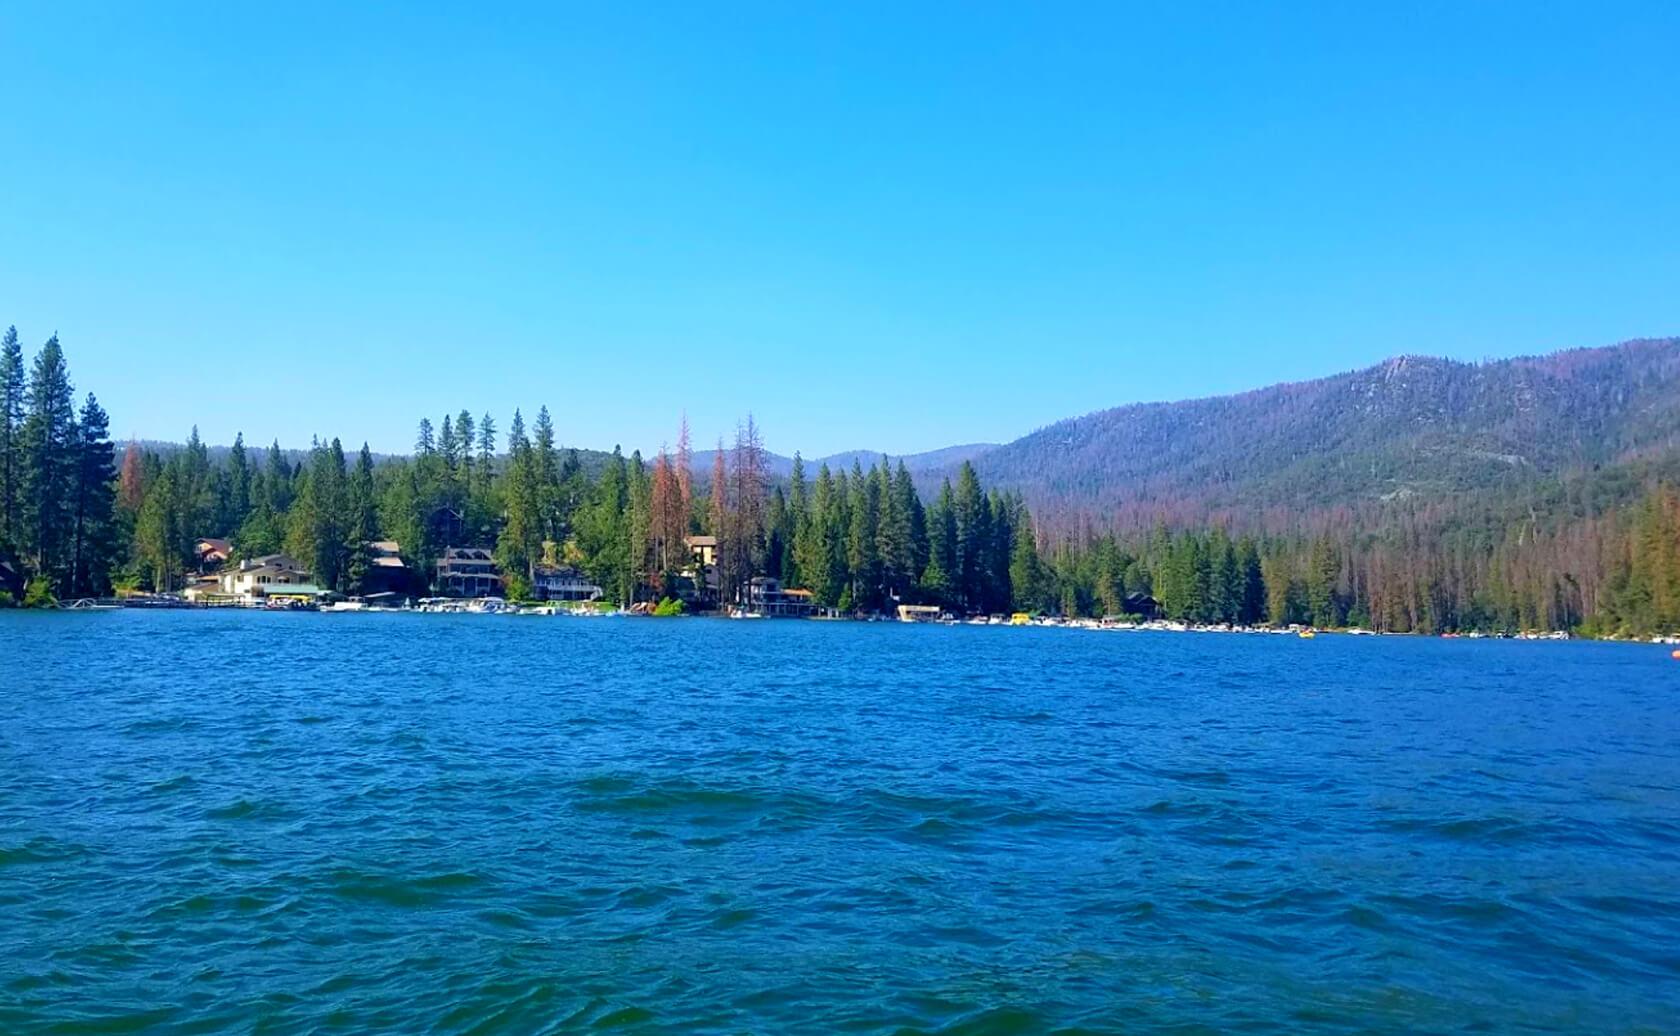 Bass-Lake-Reservoir-Fishing-Guide-Report-California-05